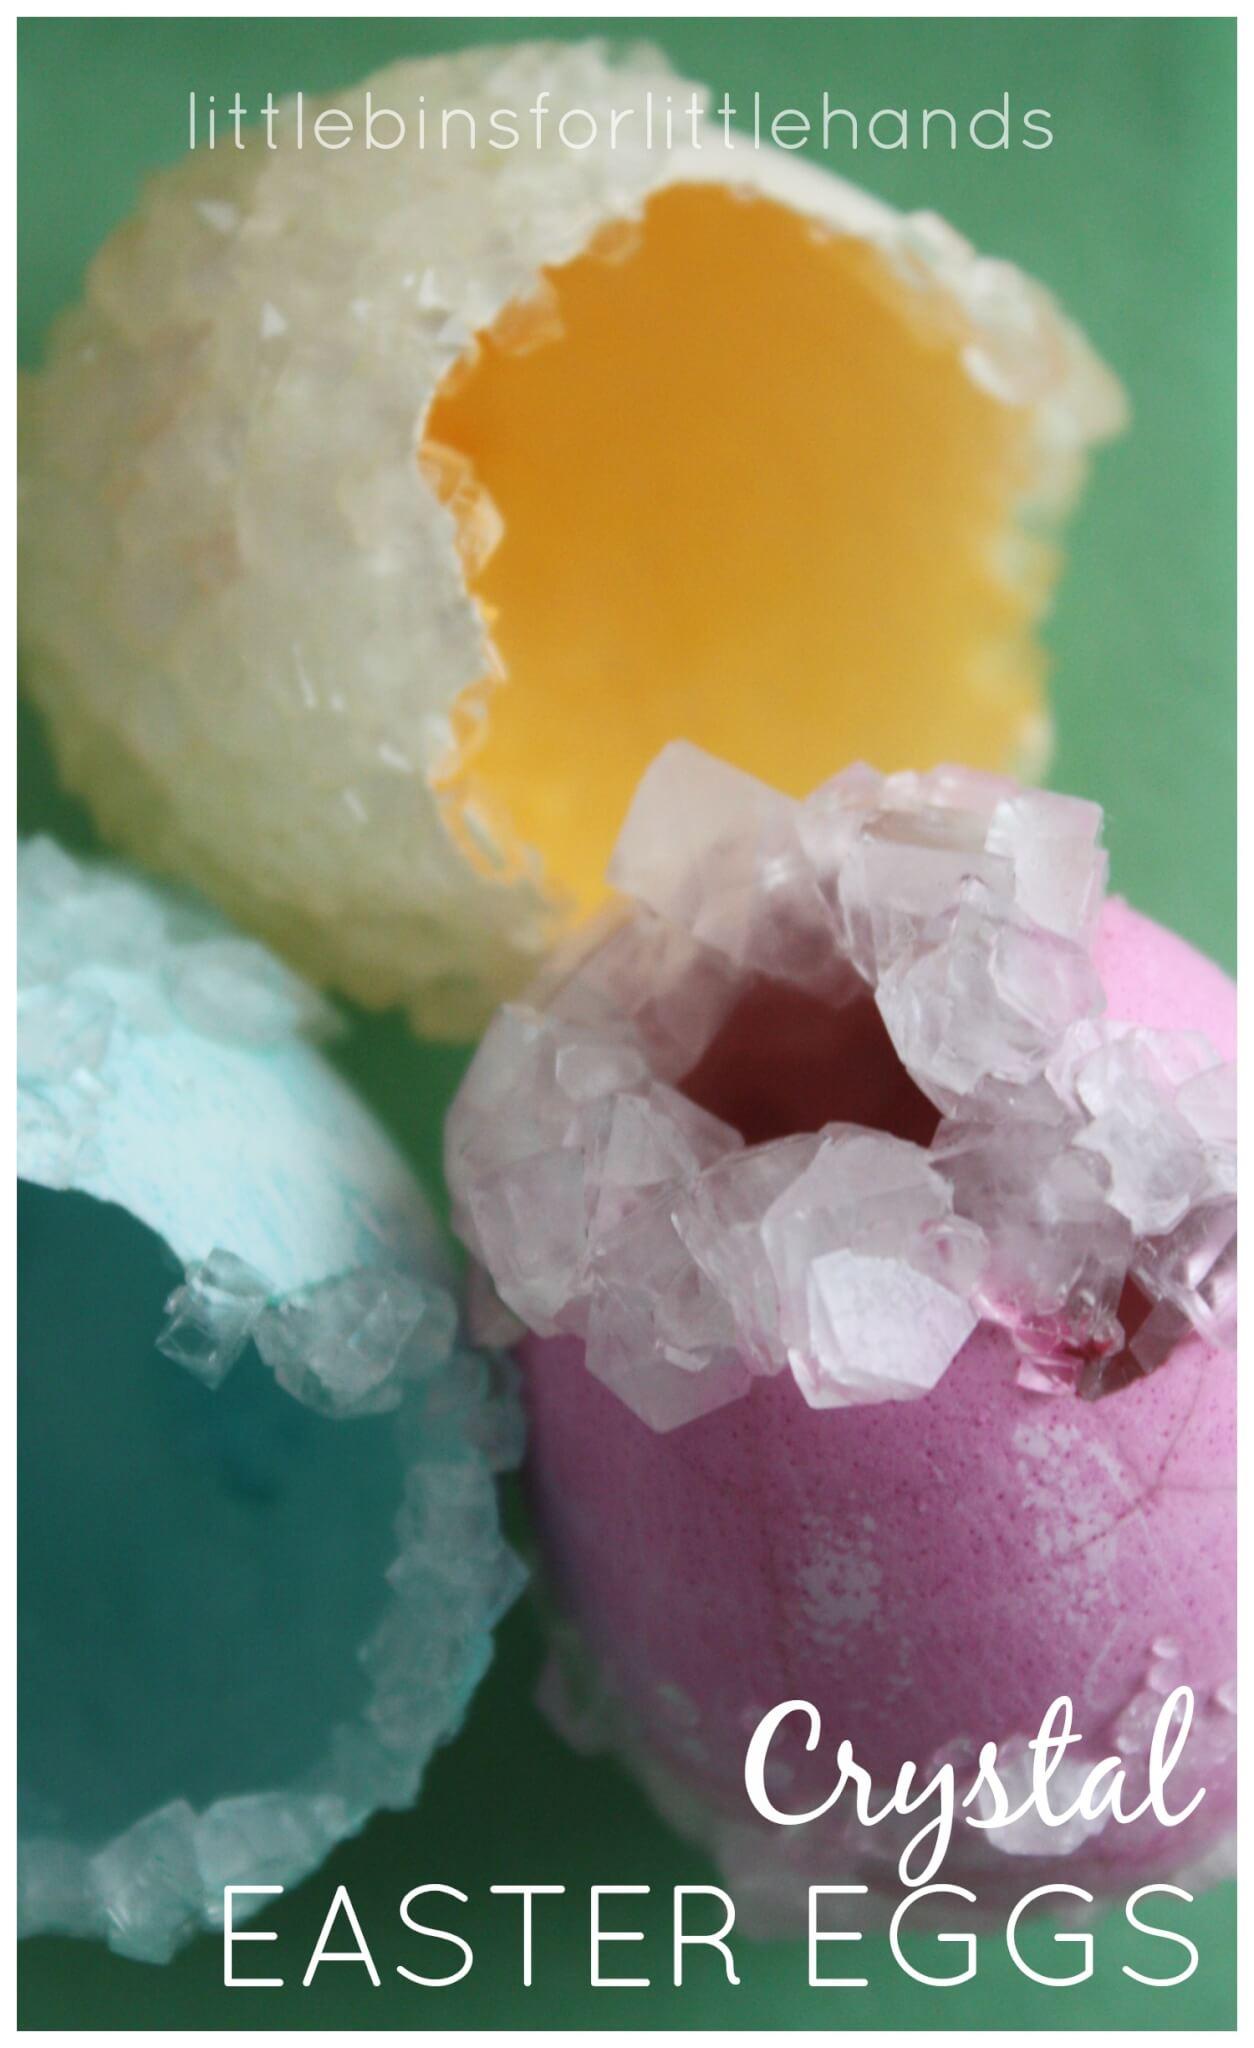 crystal eggs easter science borax crystals activity. Black Bedroom Furniture Sets. Home Design Ideas